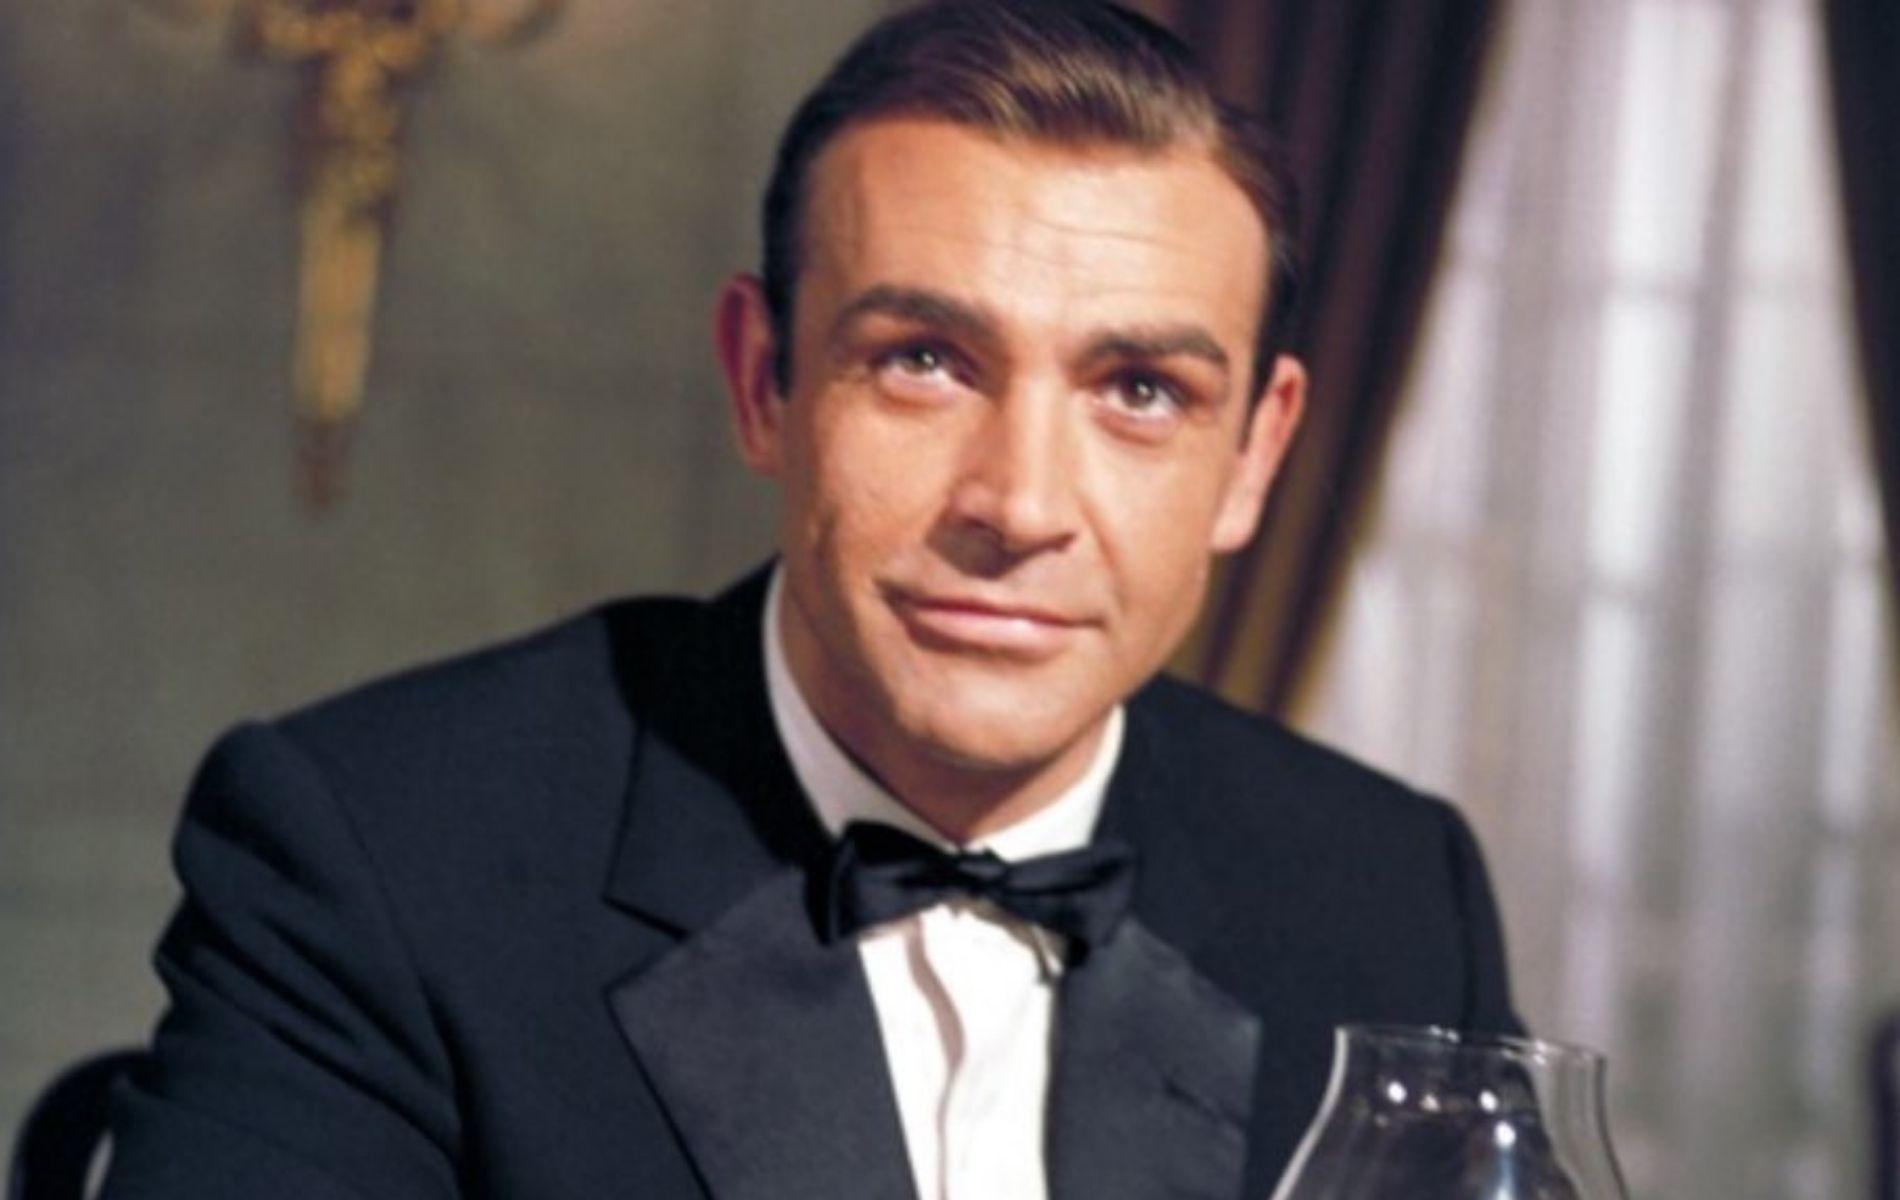 In Memory Of Sean Connery: Daniel Craig, Pierce Brosnan & More Pay Tribute On Instagram